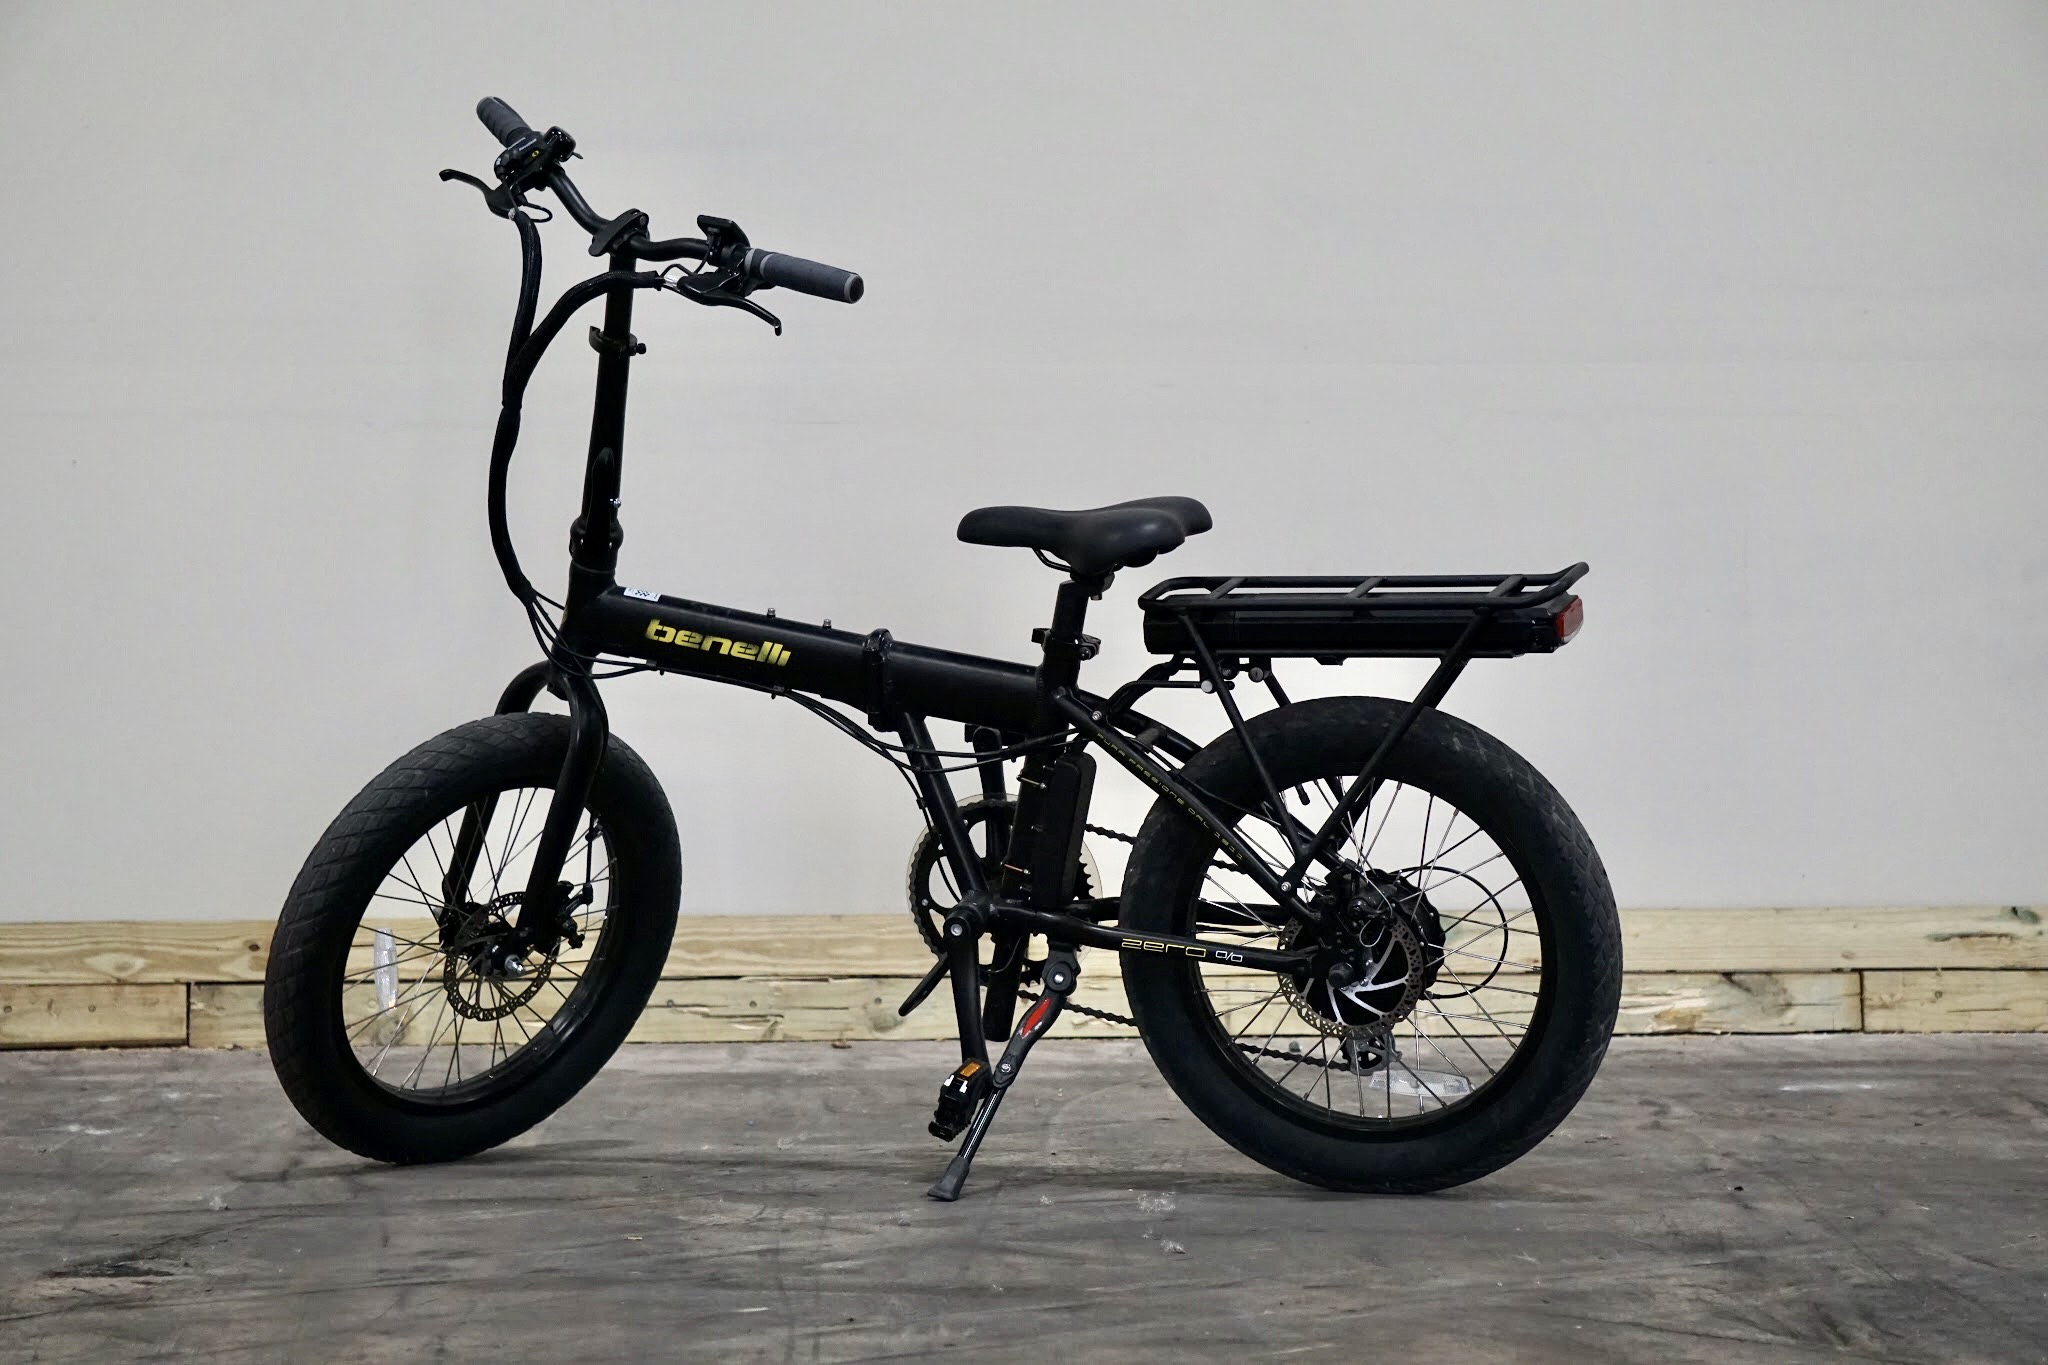 Trail Master Benelli E-fold 500, Electric Bike